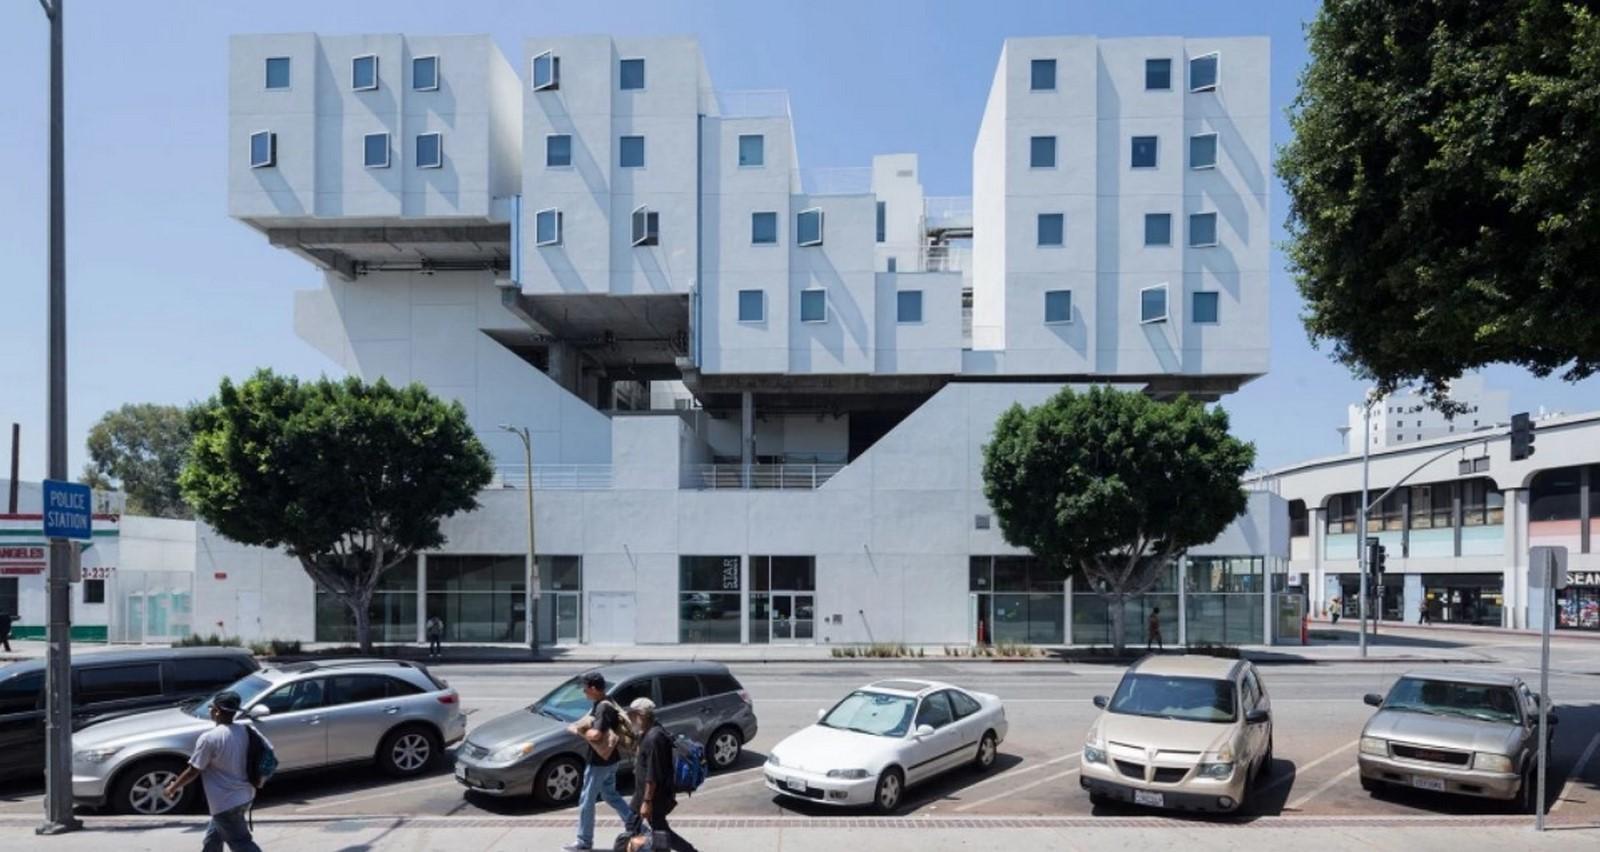 Star Apartments by Michael Maltzan - Sheet1